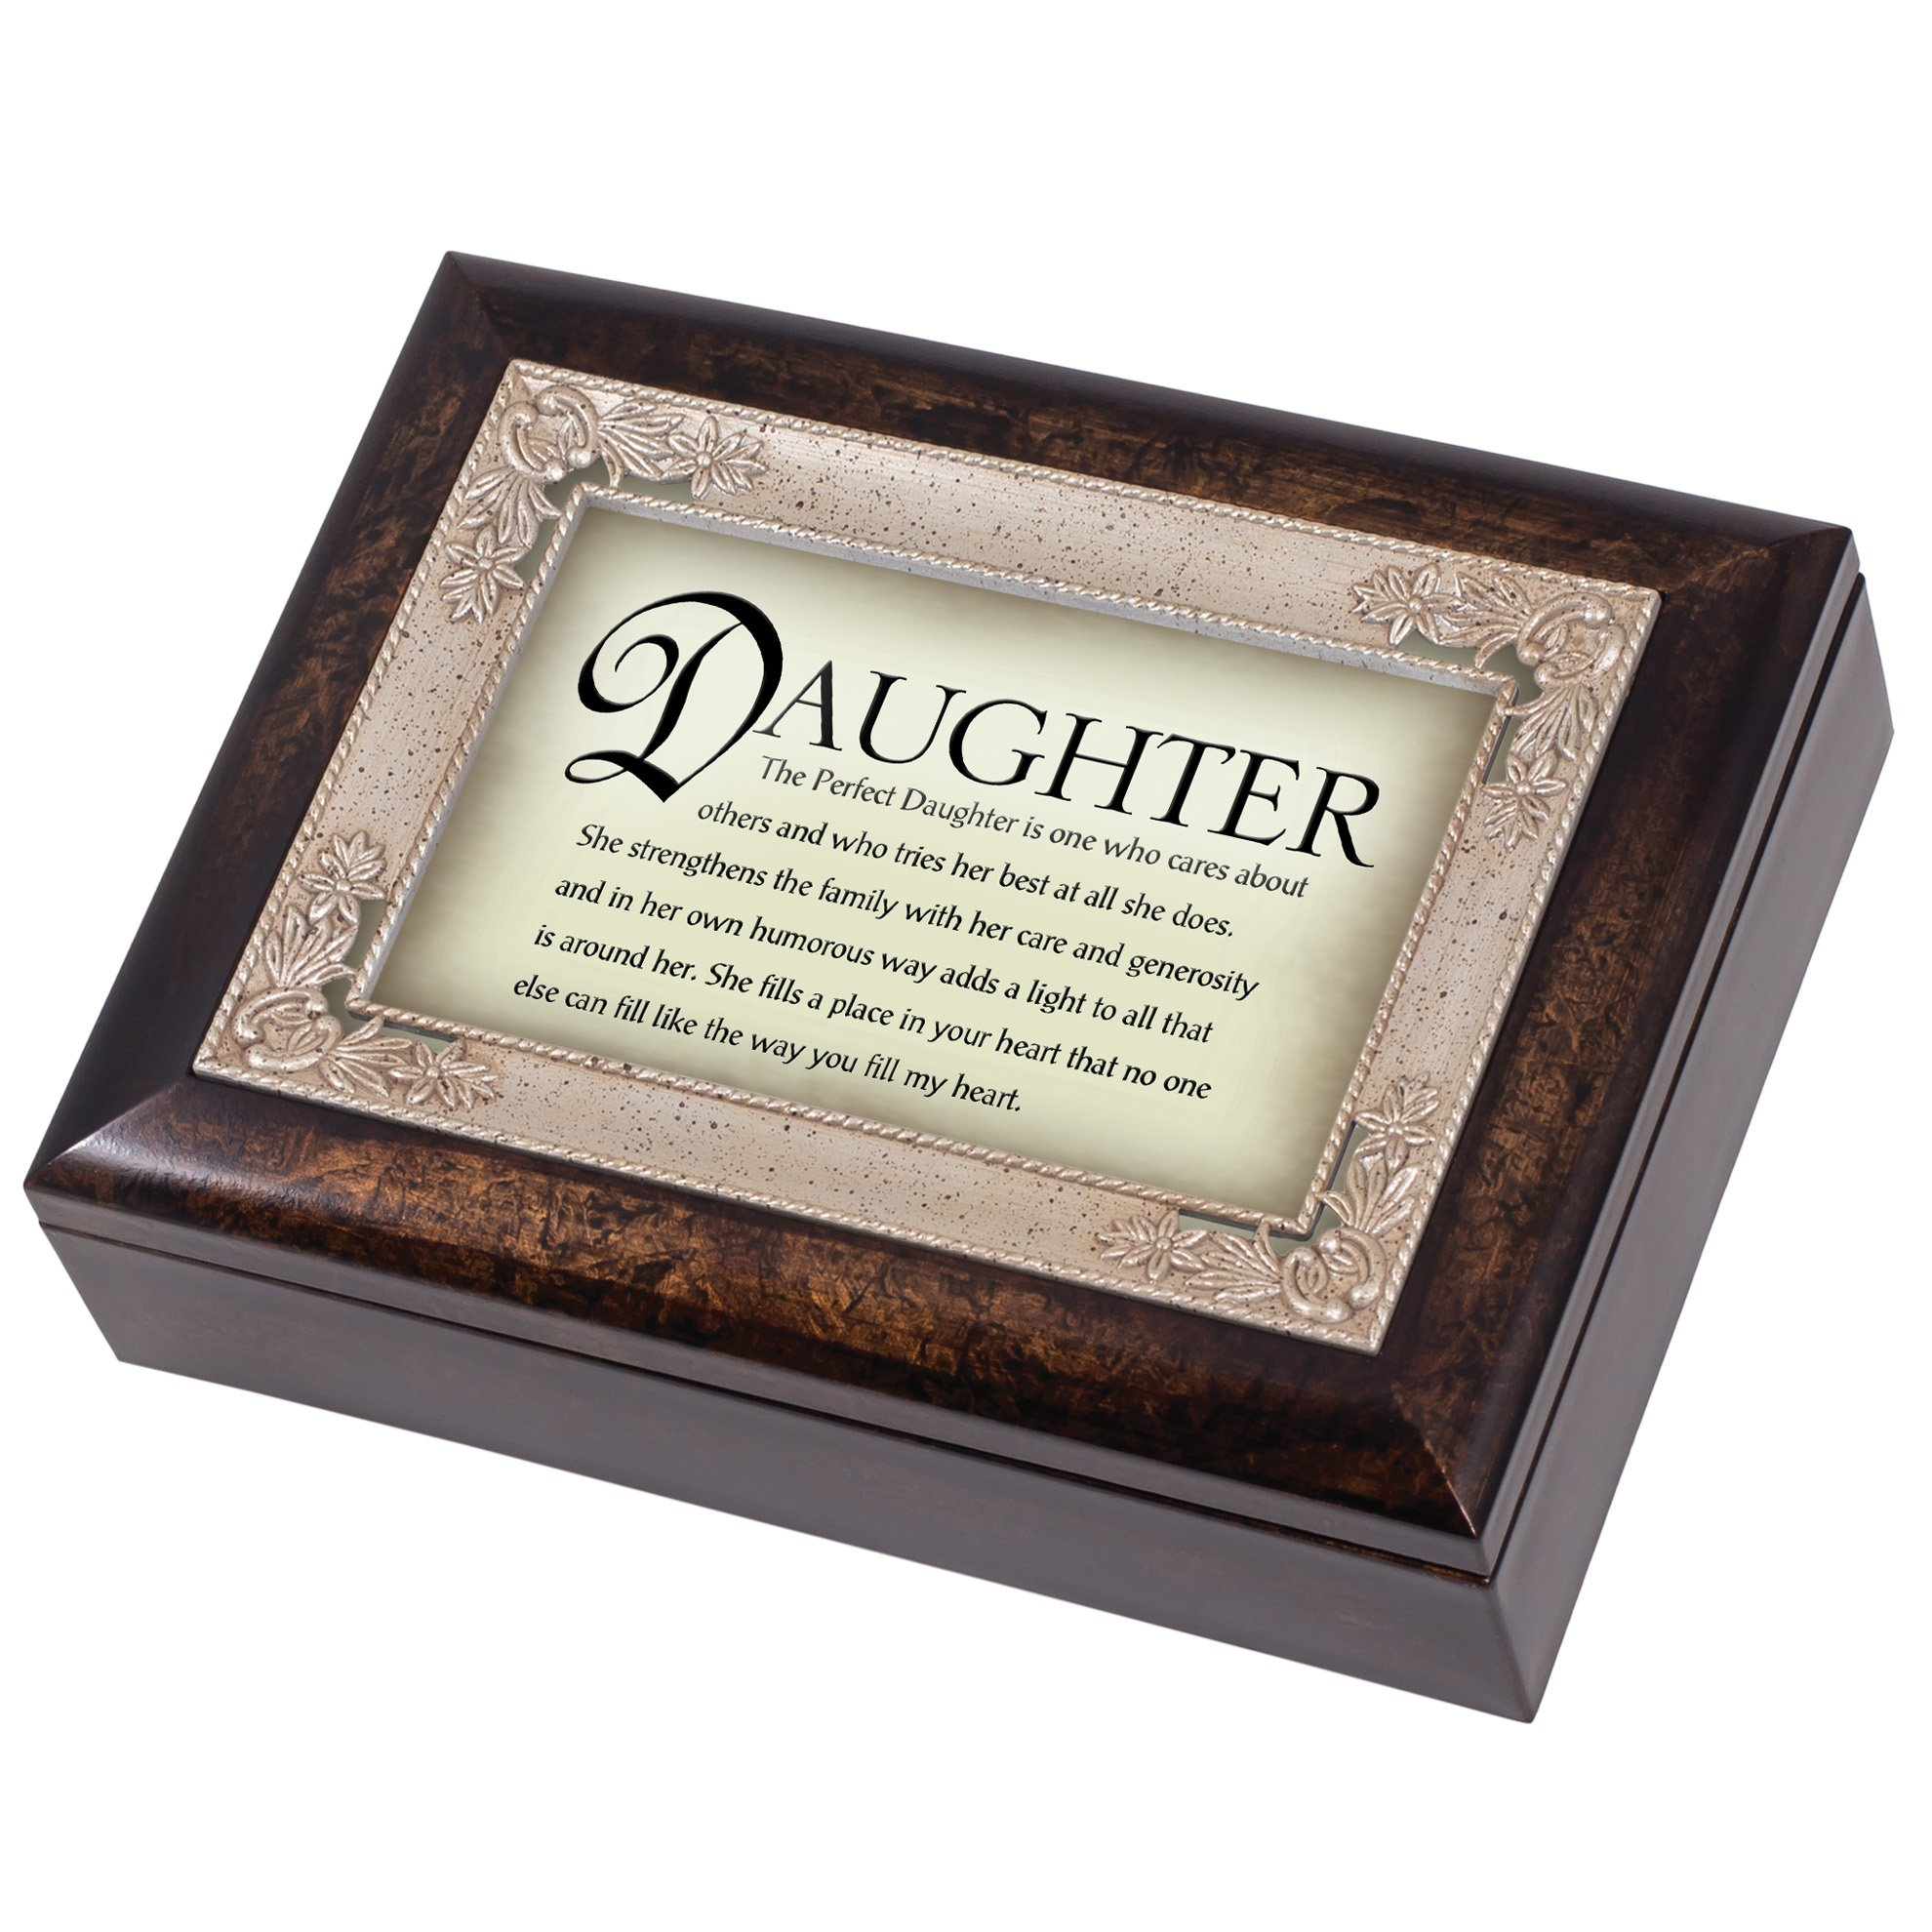 The Perfect Daughter Dark Wood Finish Jewelry Music Box Plays Tune Amazing Grace